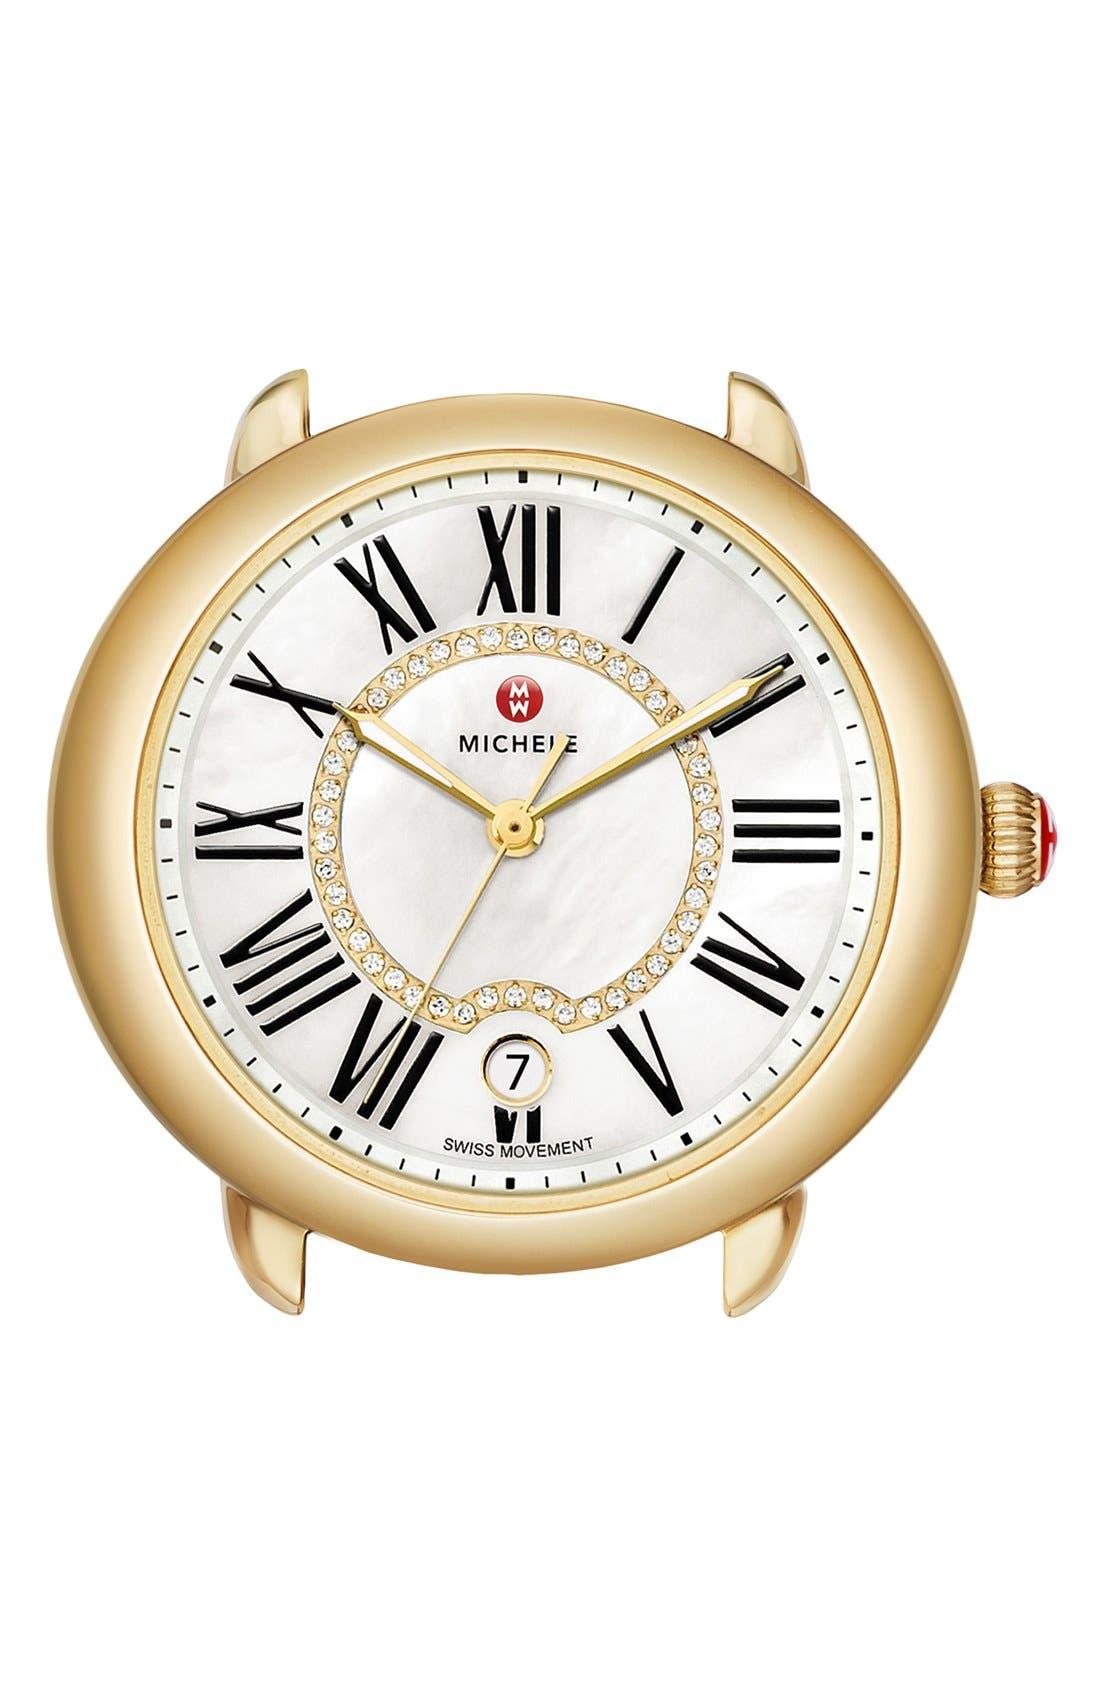 Main Image - MICHELE Serein 16 Diamond Dial Watch Head, 34mm x 36mm